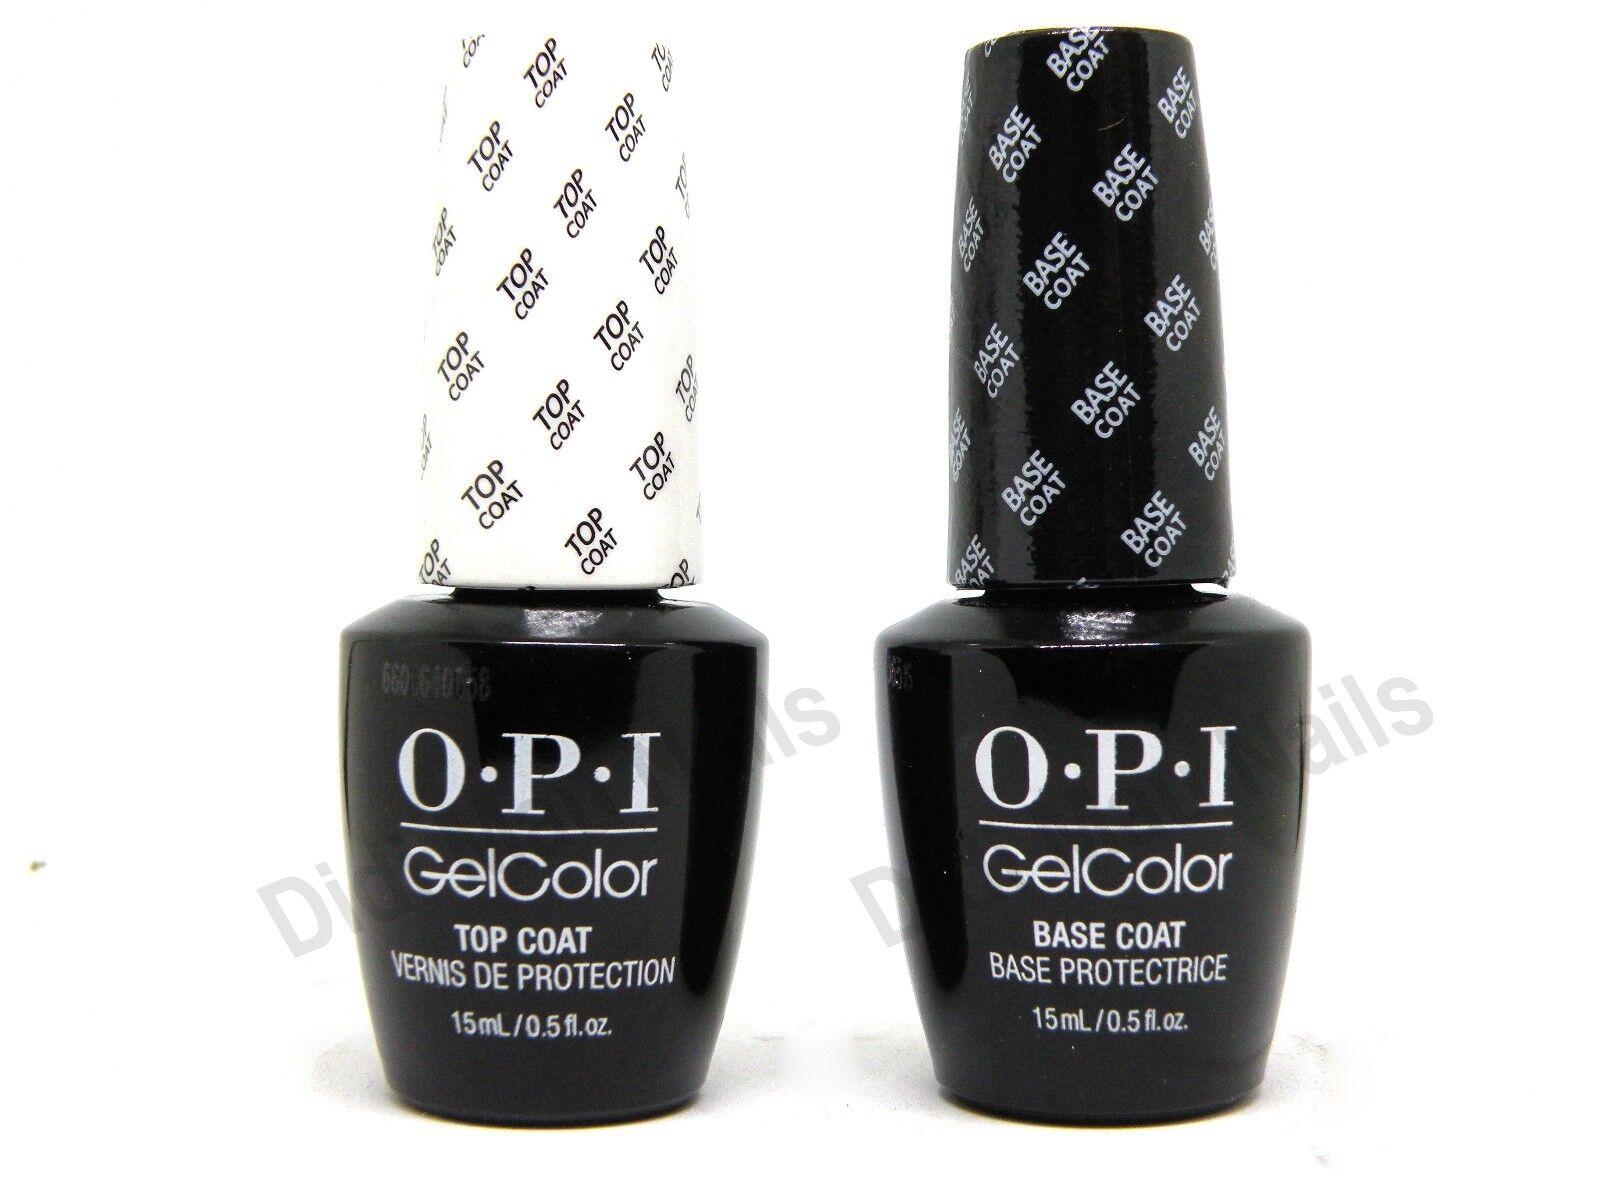 OPI Gelcolor Soak off Gel Top & Base Coat 0.5 oz / 15 ml eac